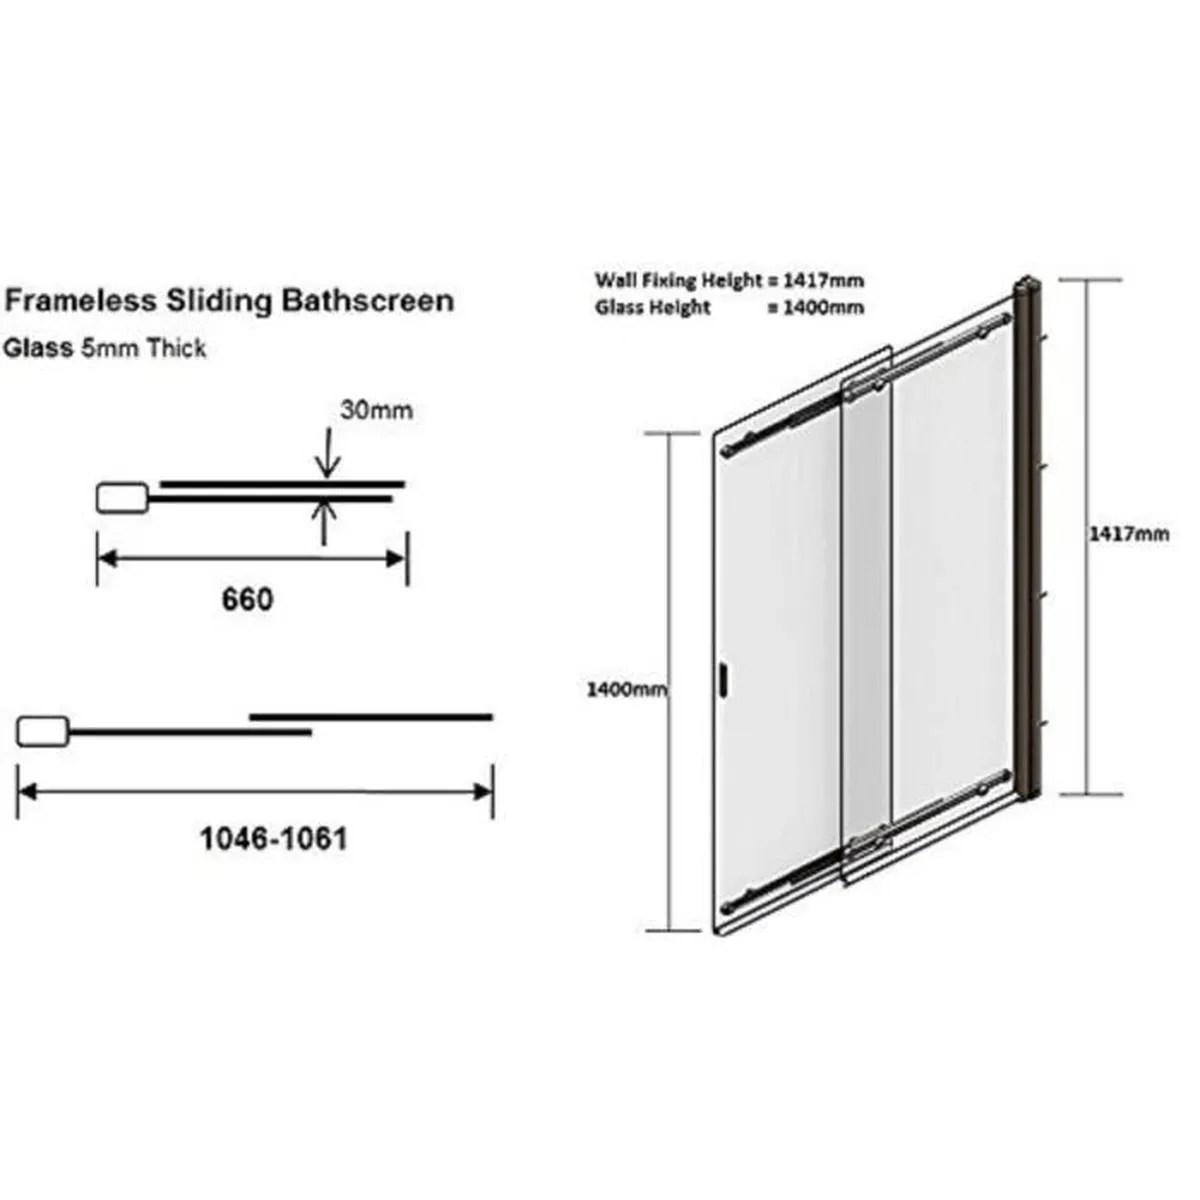 Coram Showers Ssl2105cuc 1400 Mm X 6501065 Mm 2 Panel